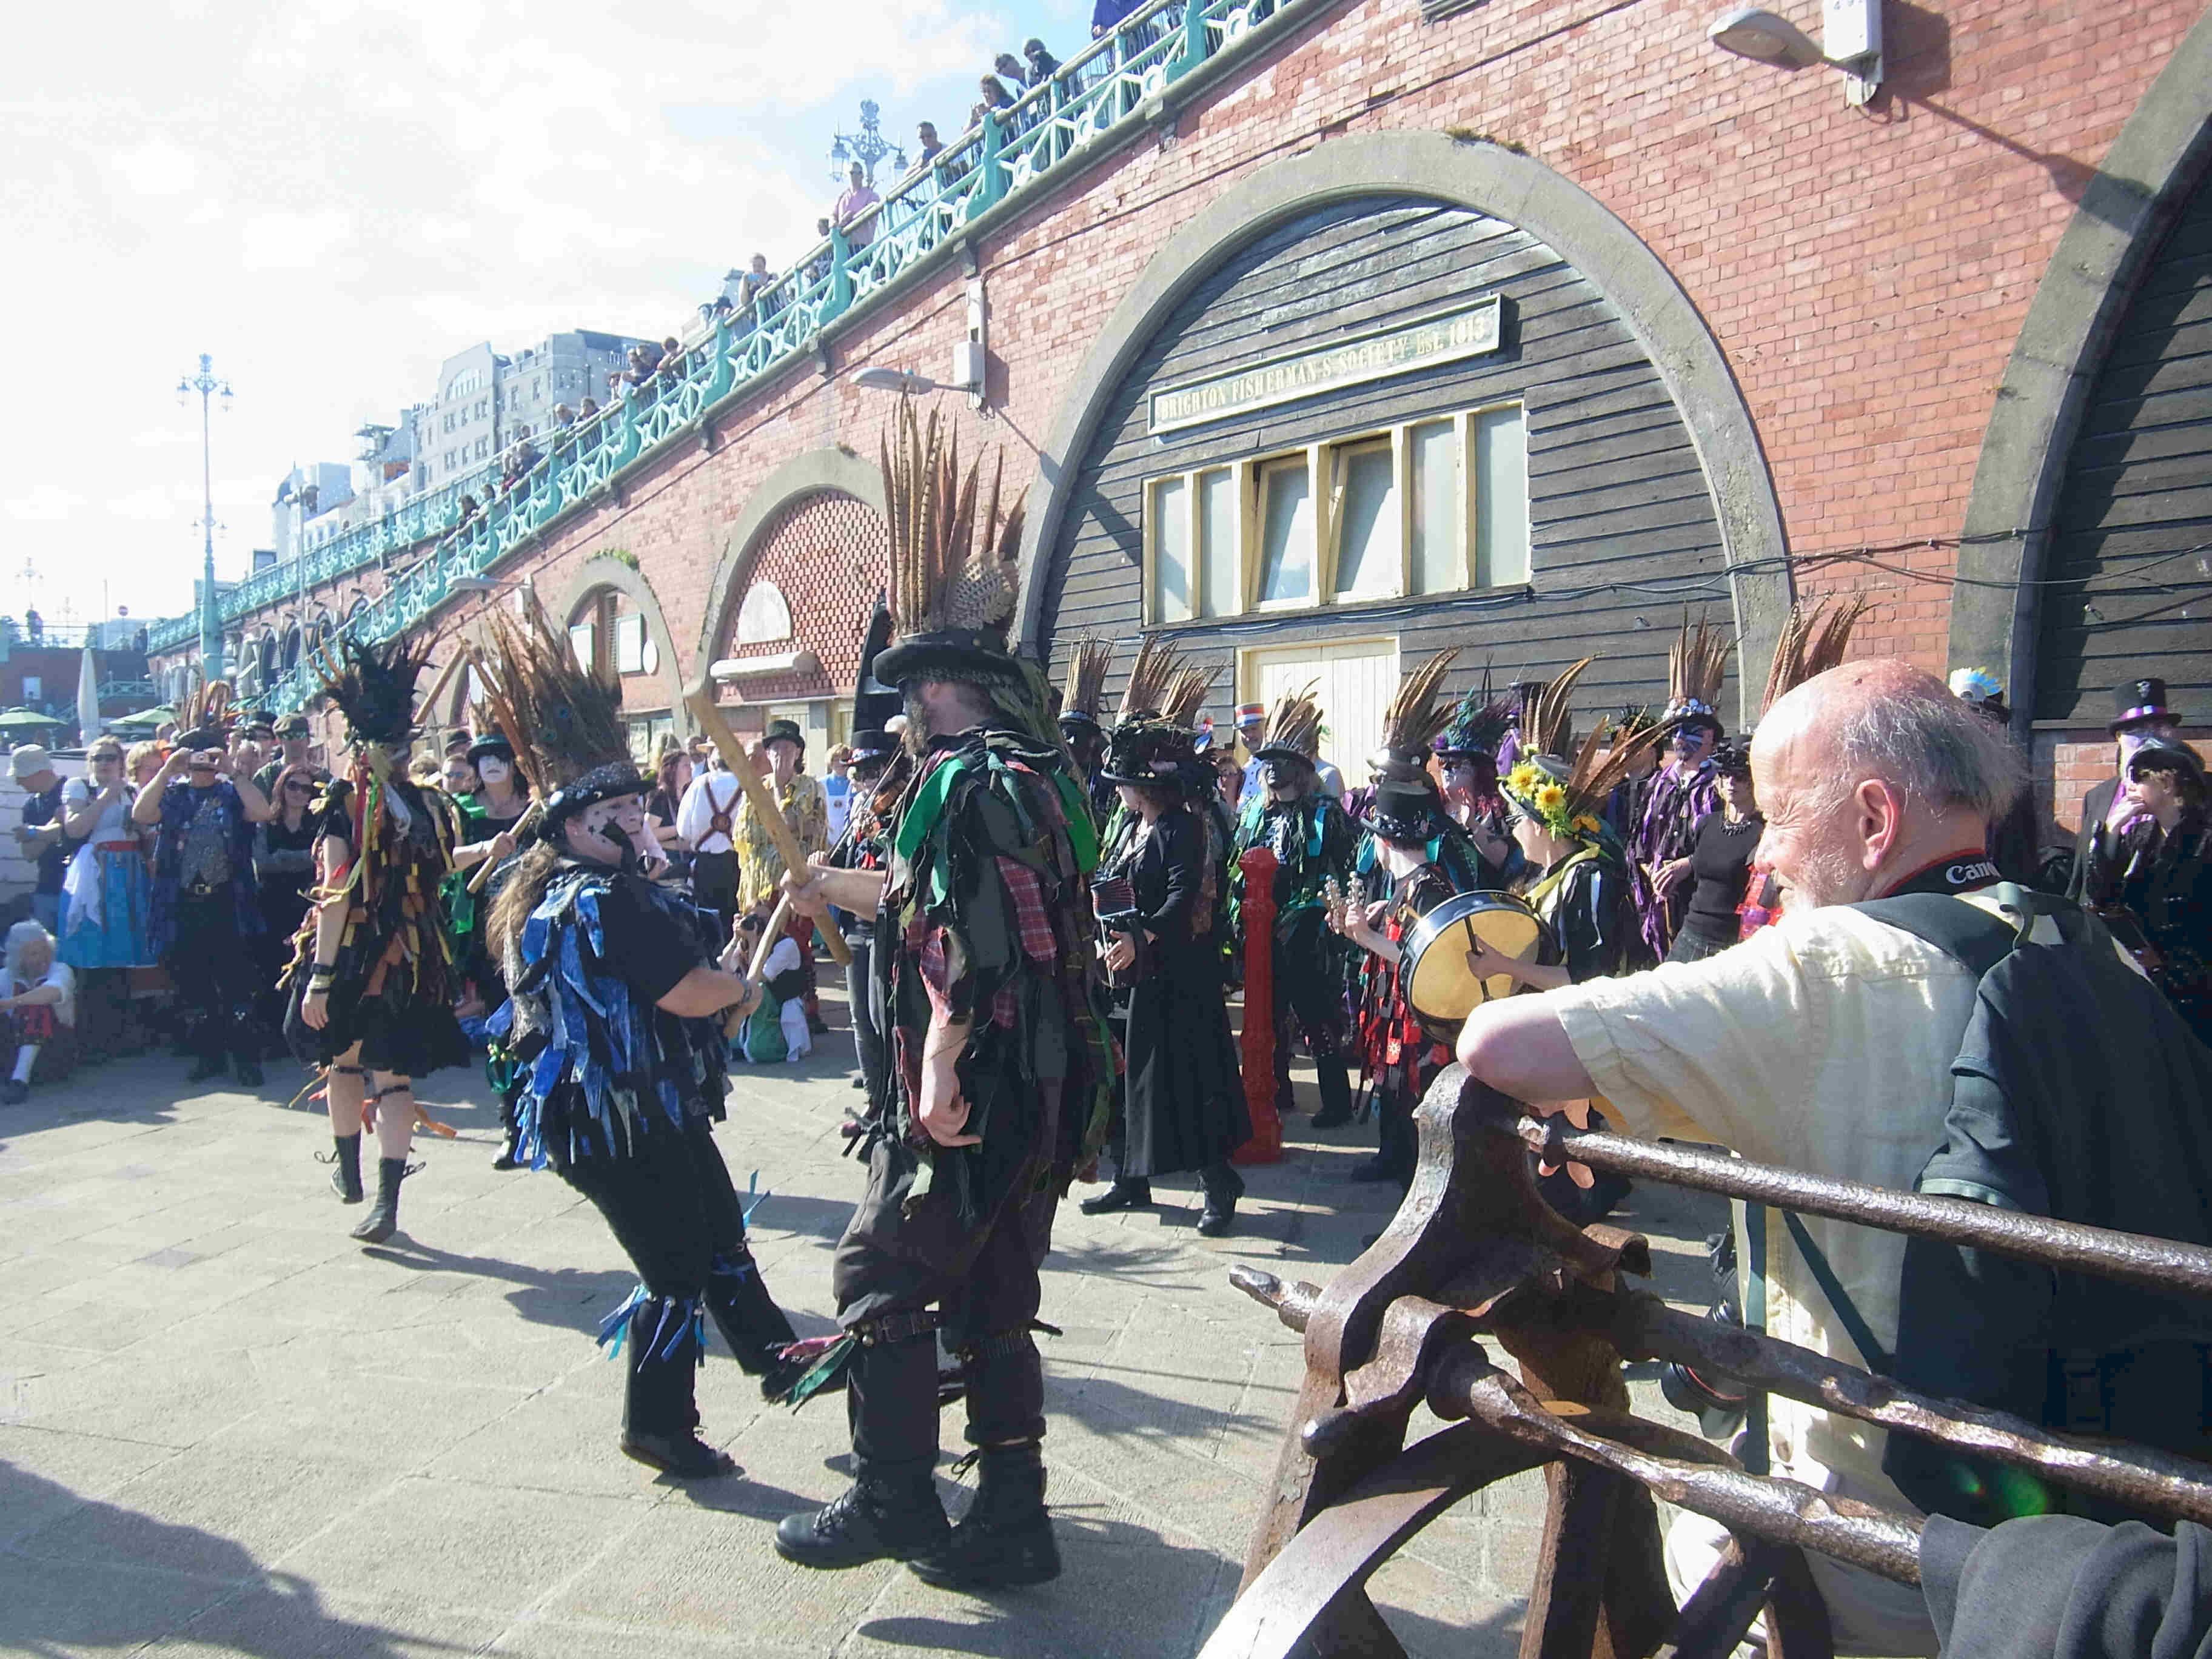 Morris dancing on Brighton seafront 2015